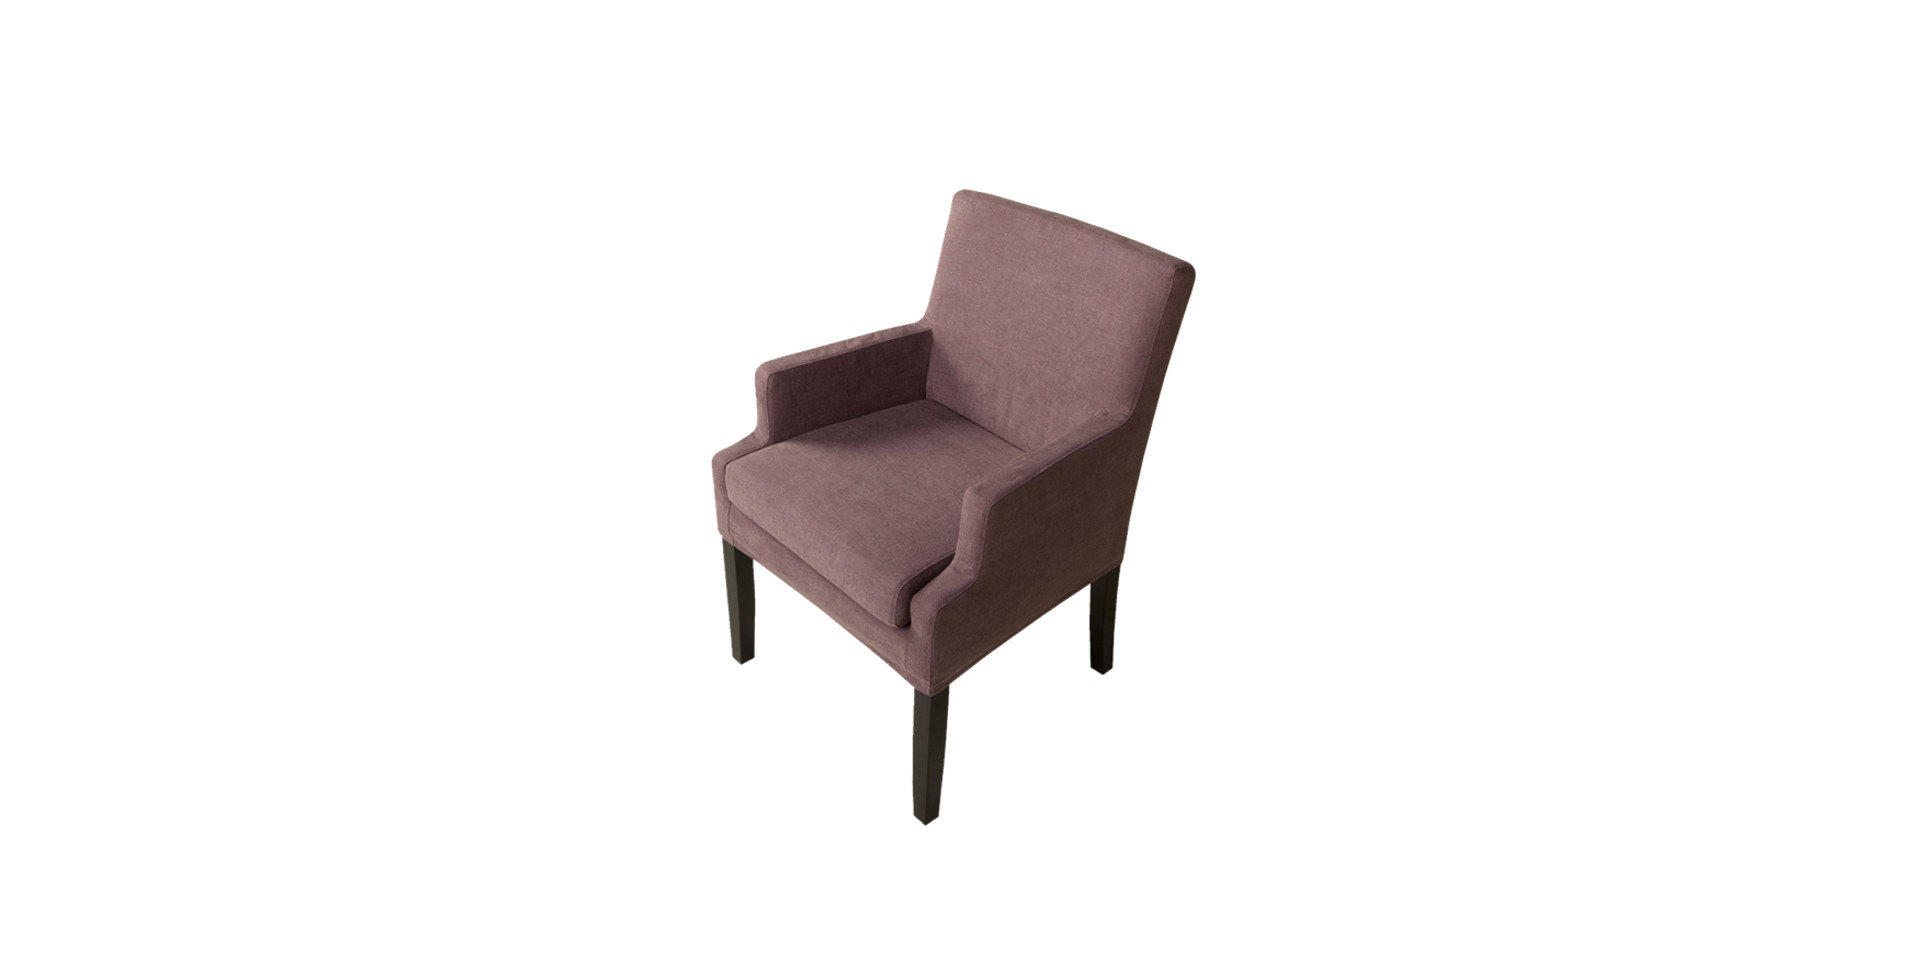 sits-merlin-fauteuil-chair_brest116_plum_5